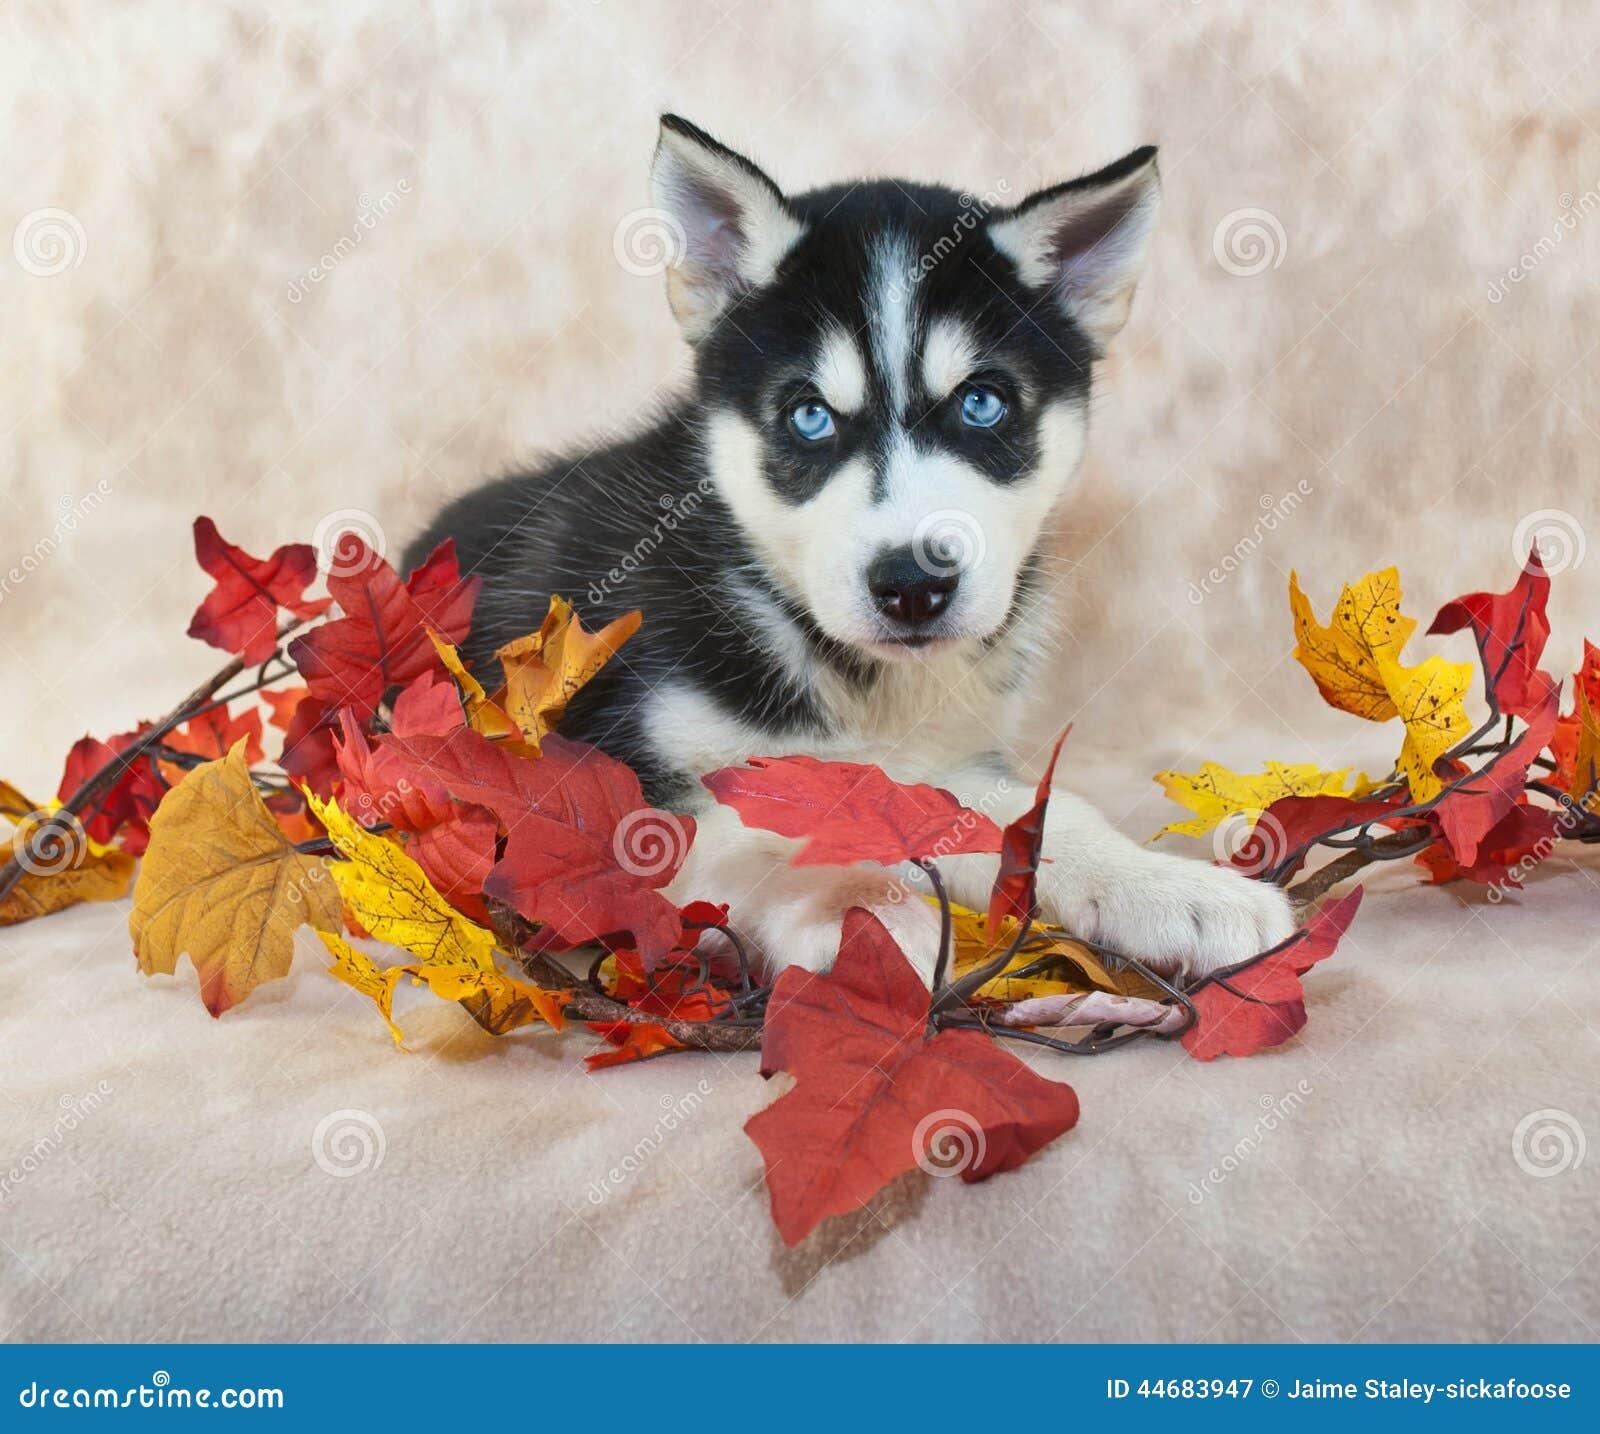 Chute Husky Puppy